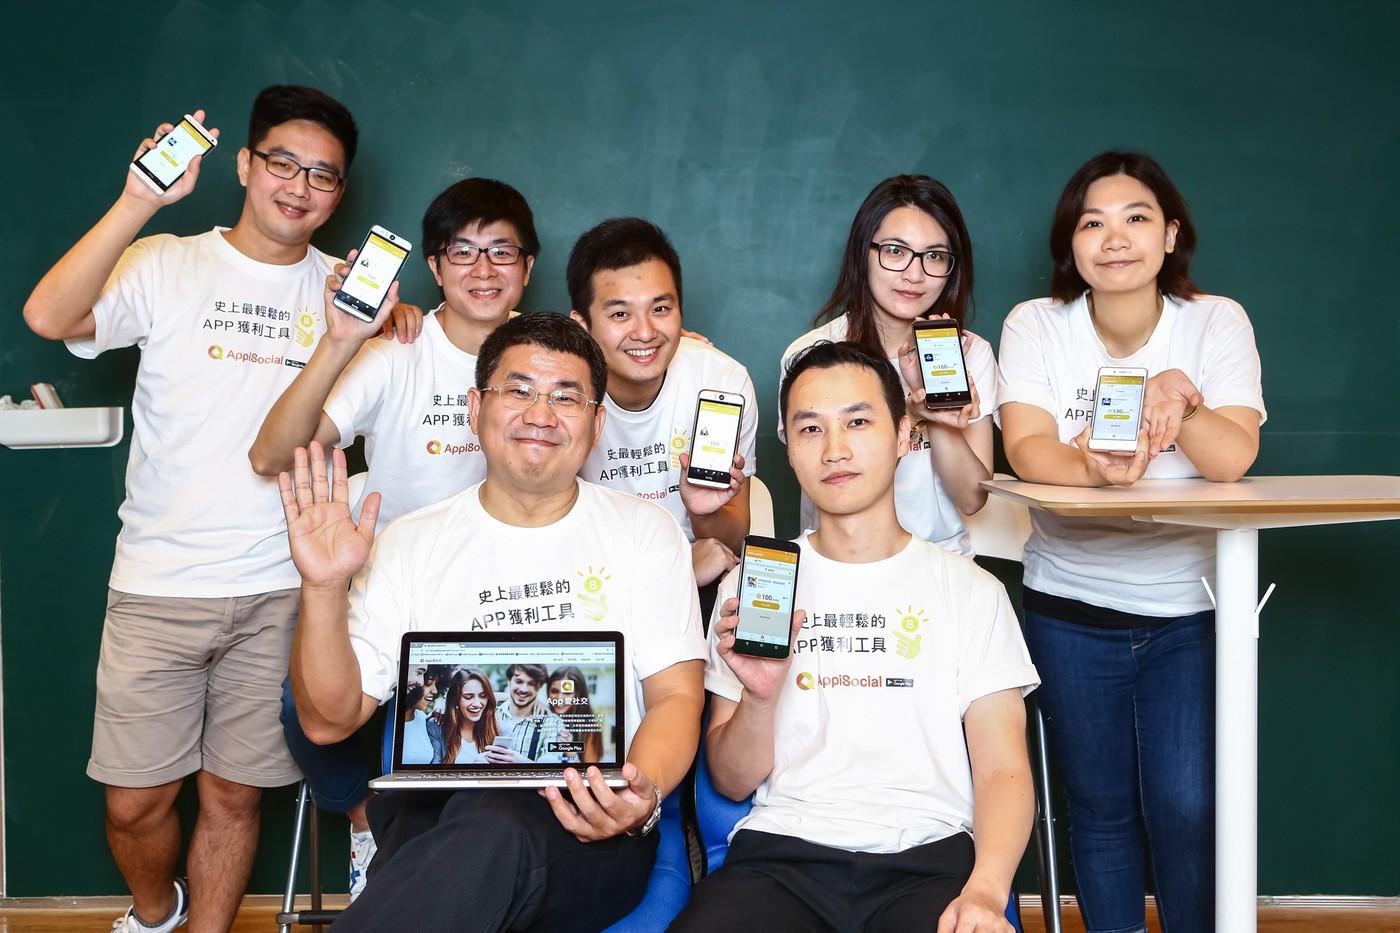 [Meet創業之星]C2B+社交+金融科技,AppiSocial顛覆行動廣告推廣模式!